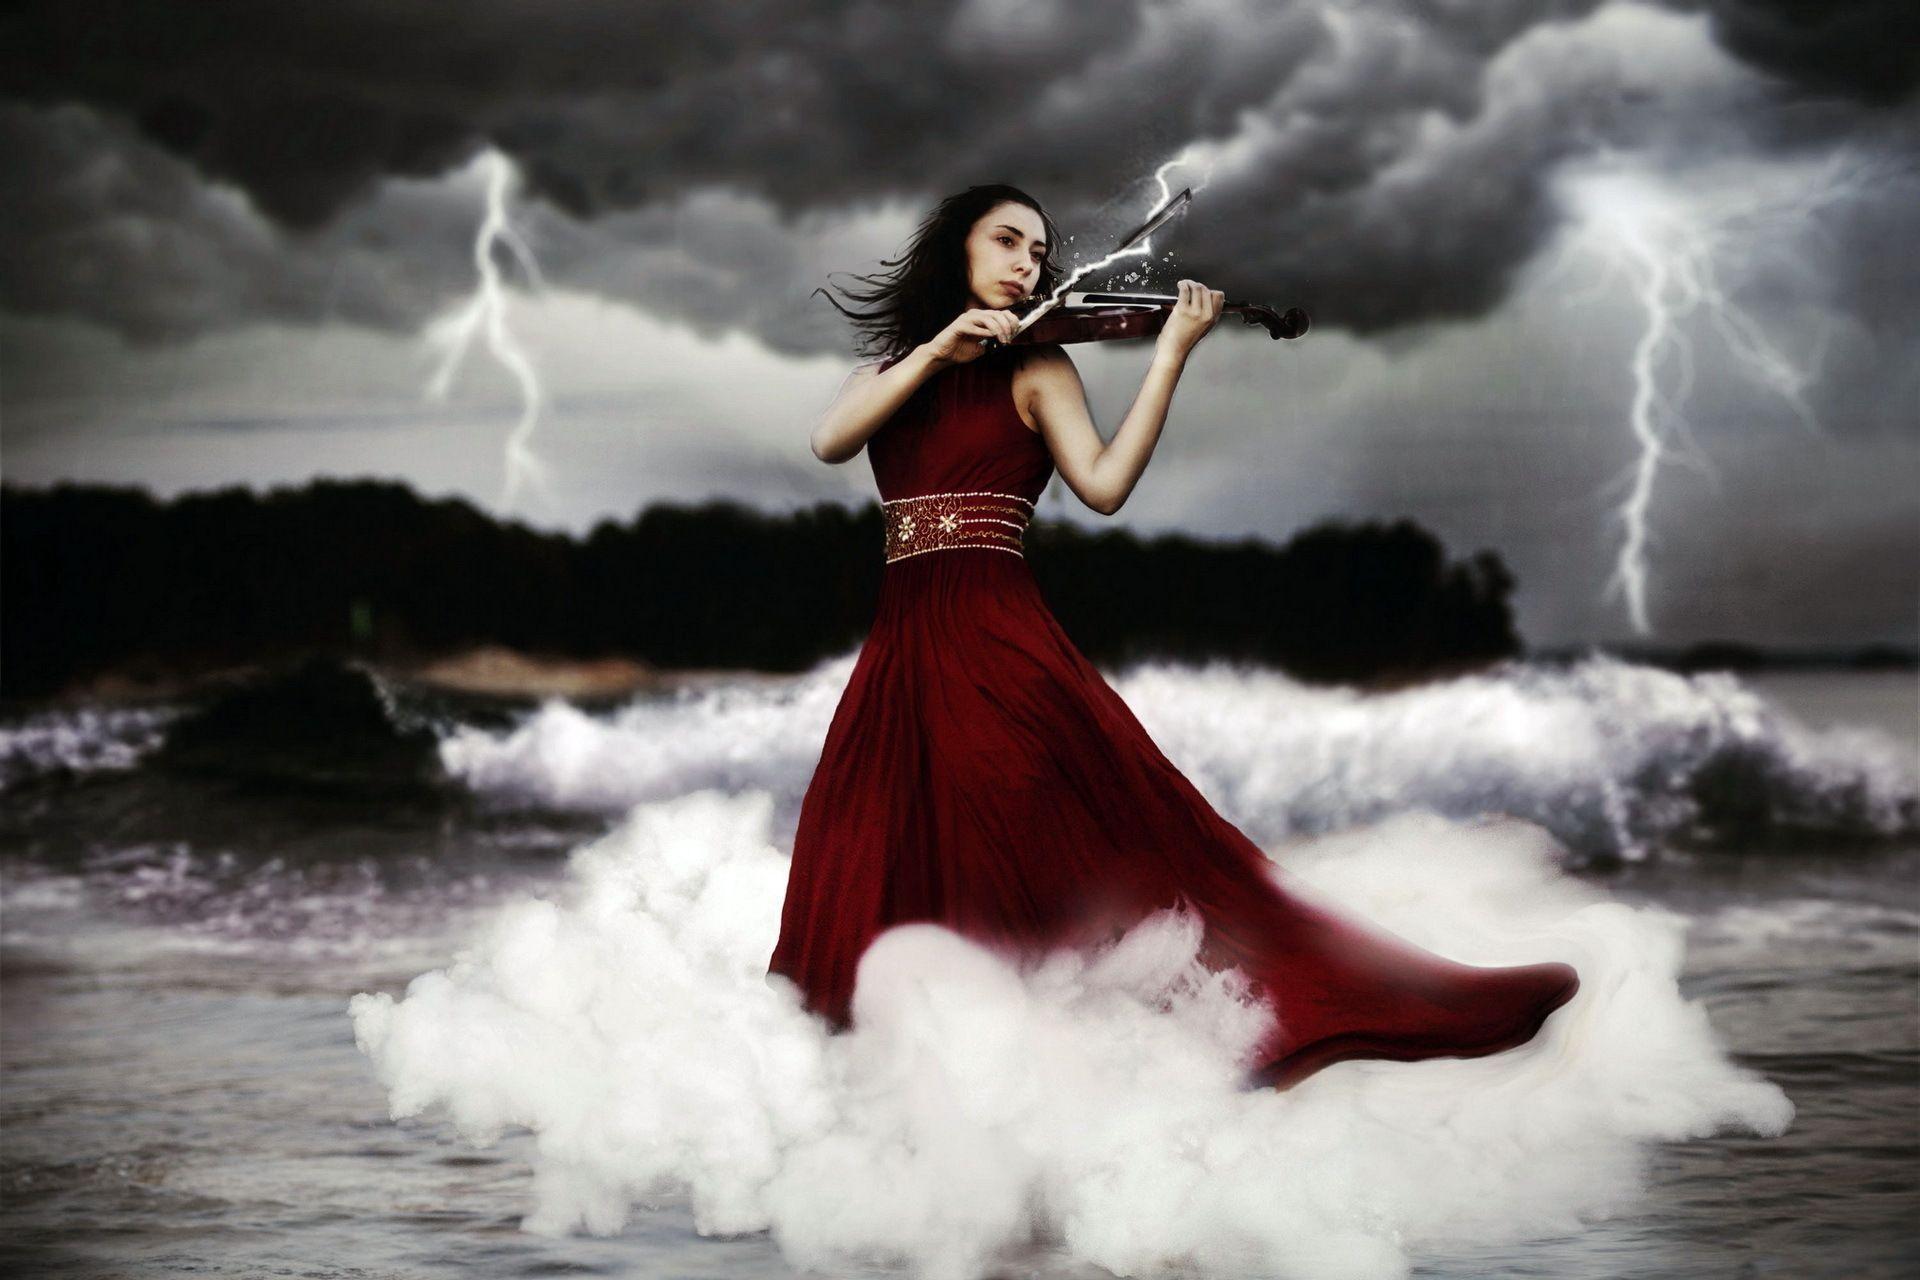 Women Playing Music Violin Wallpaper #6425 Wallpaper | Wallpaper ...